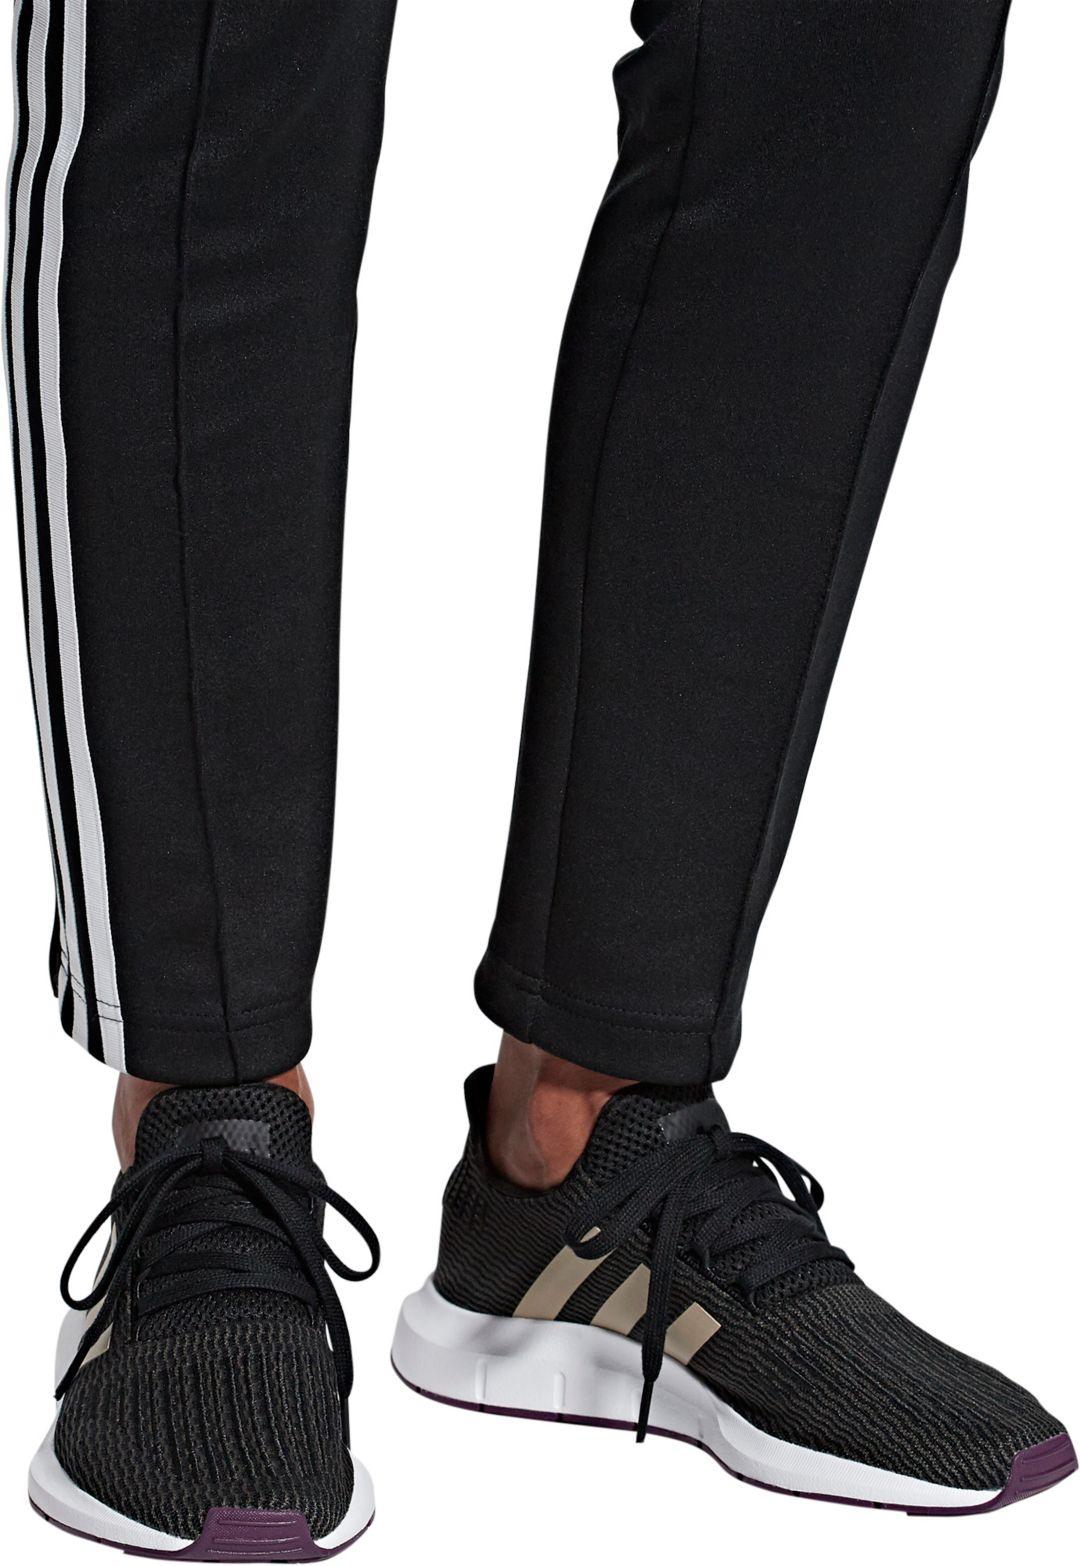 fb4ae63e70d9c adidas Originals Women s Swift Run Shoes 3